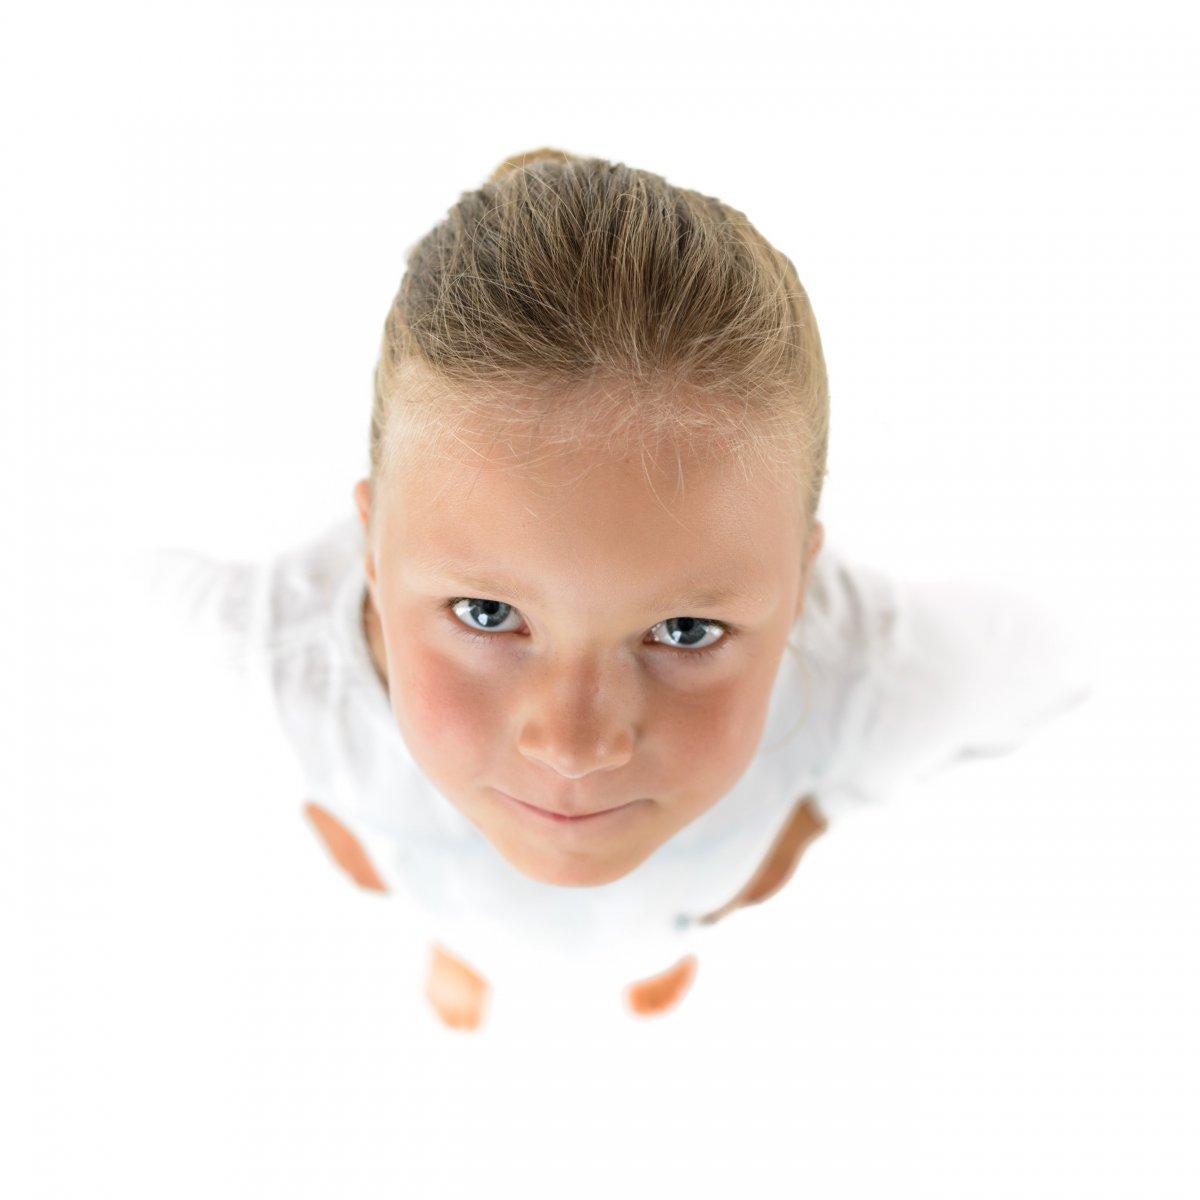 Freches Mädchen - Kindershooting